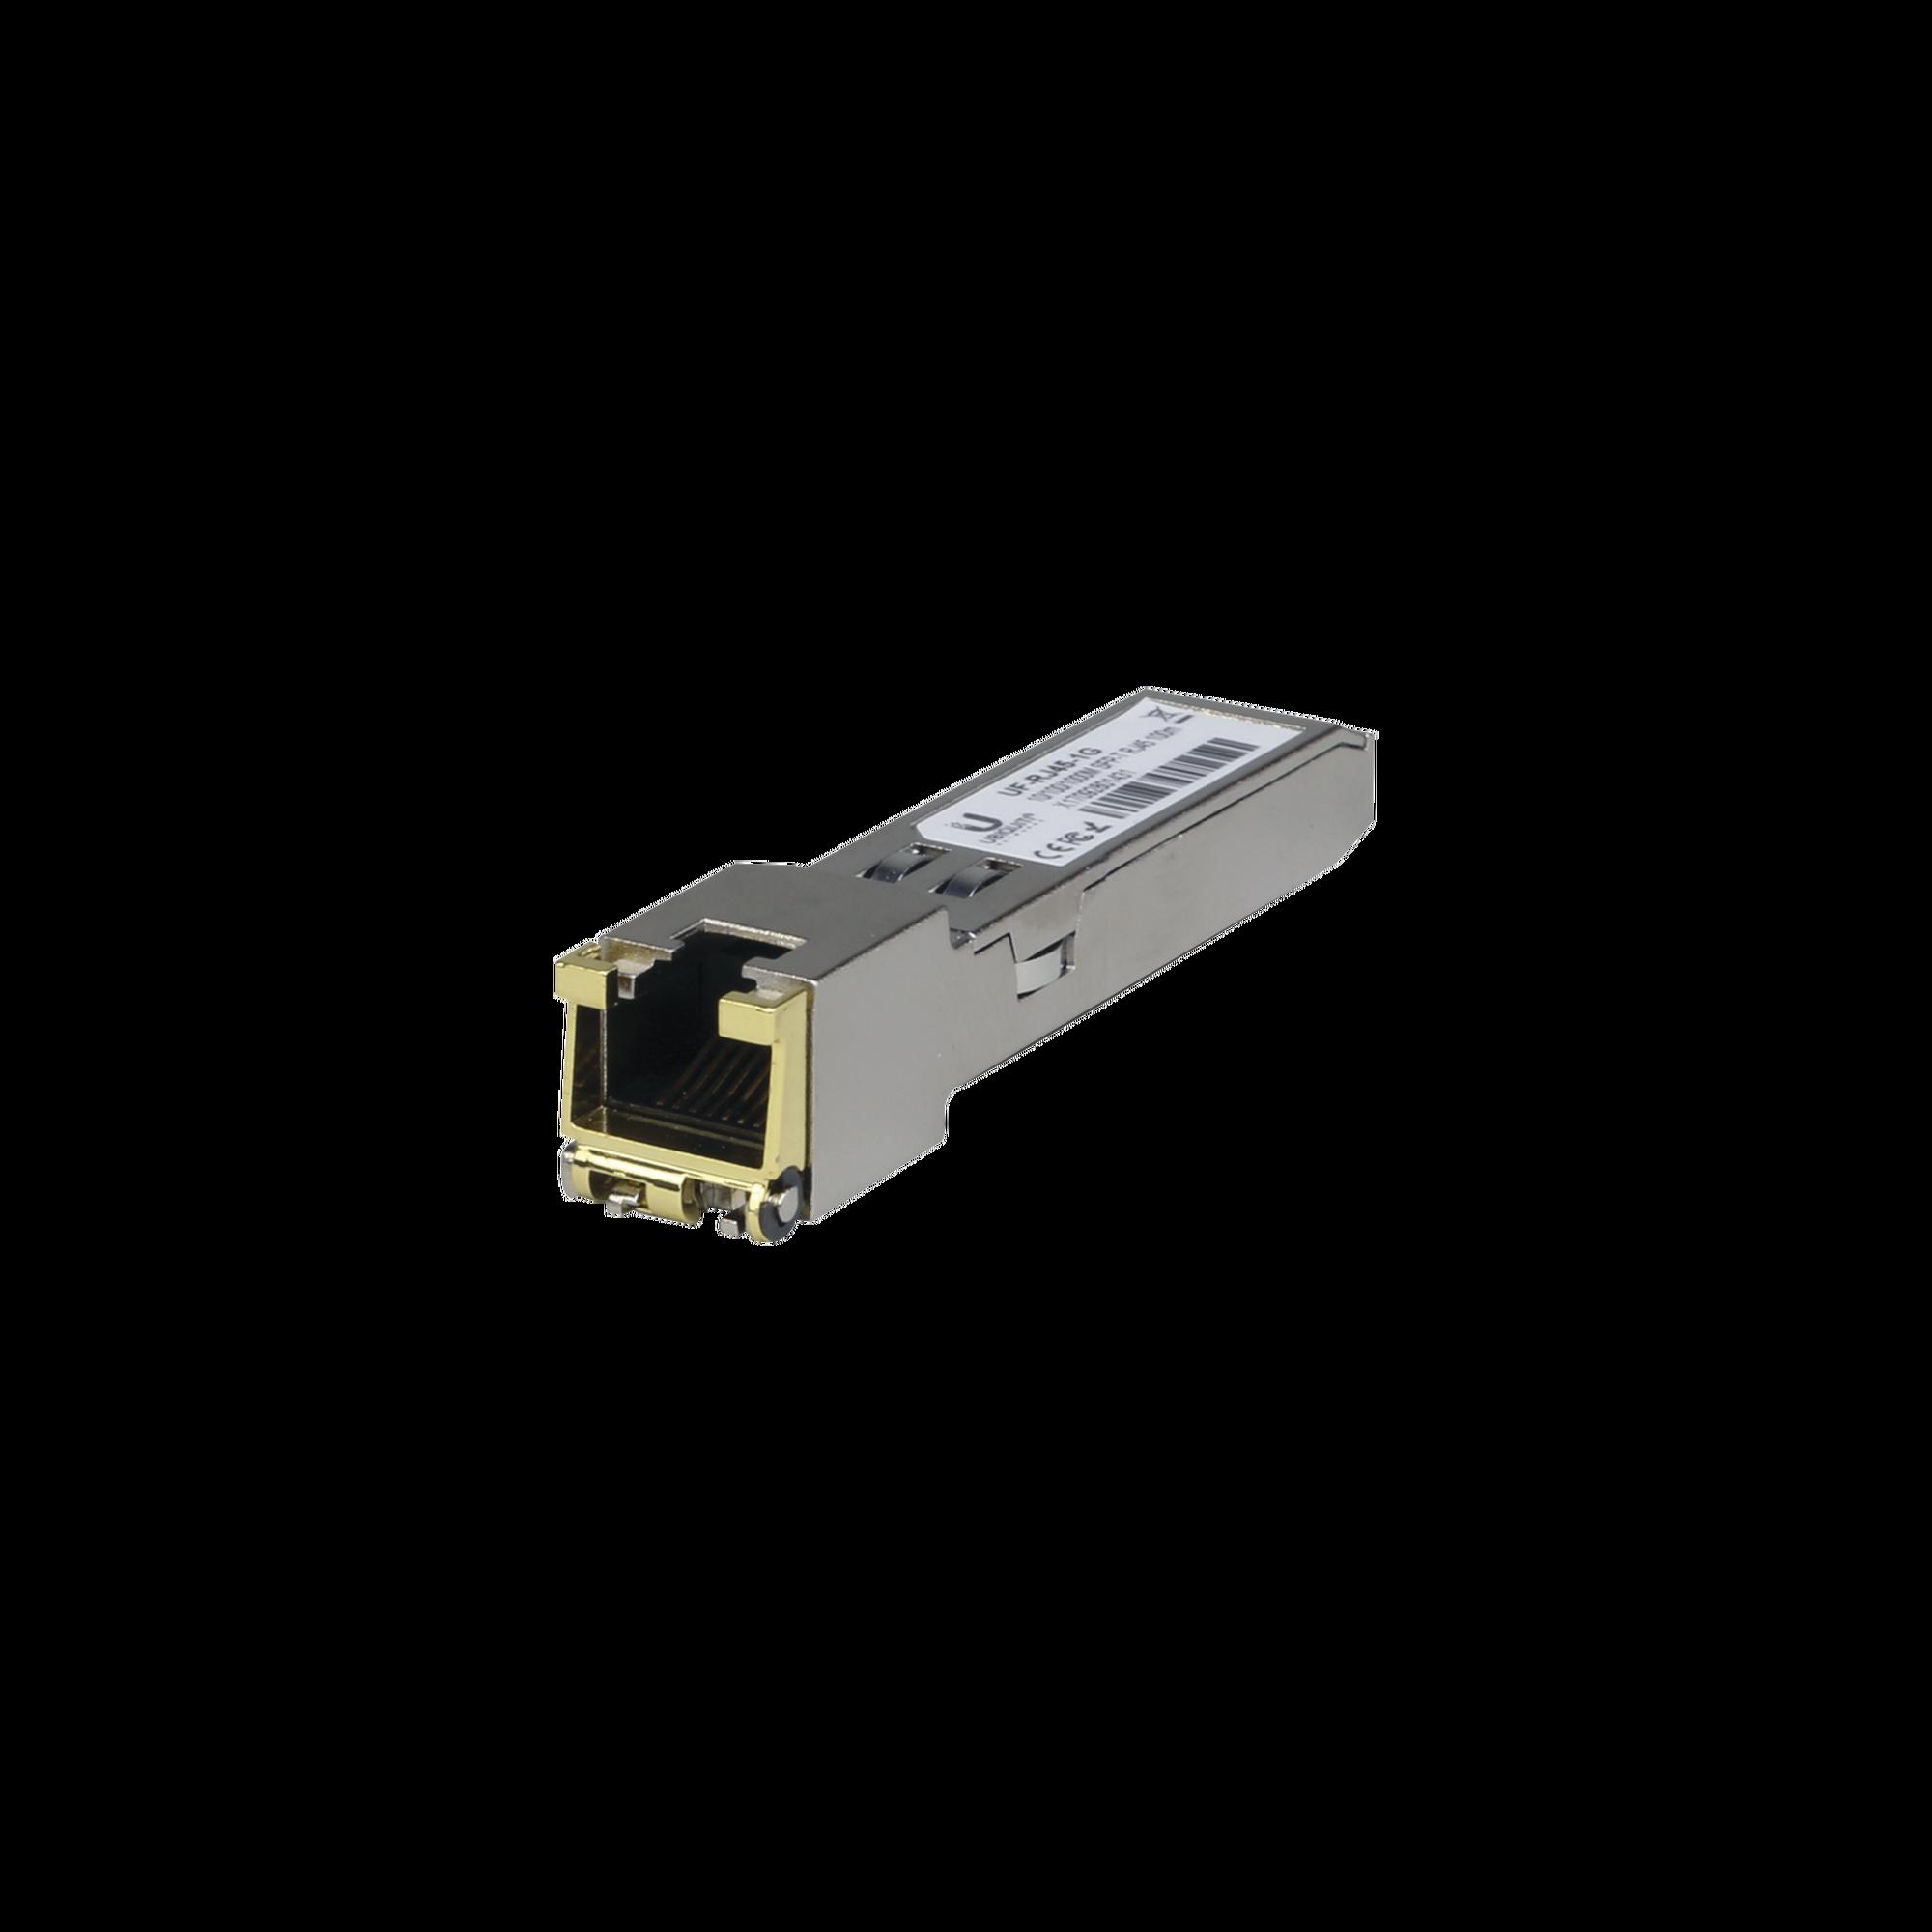 UFiber Módulo Ethernet RJ45 a SFP 10/100/1000 Mbps, distancia hasta 100 m